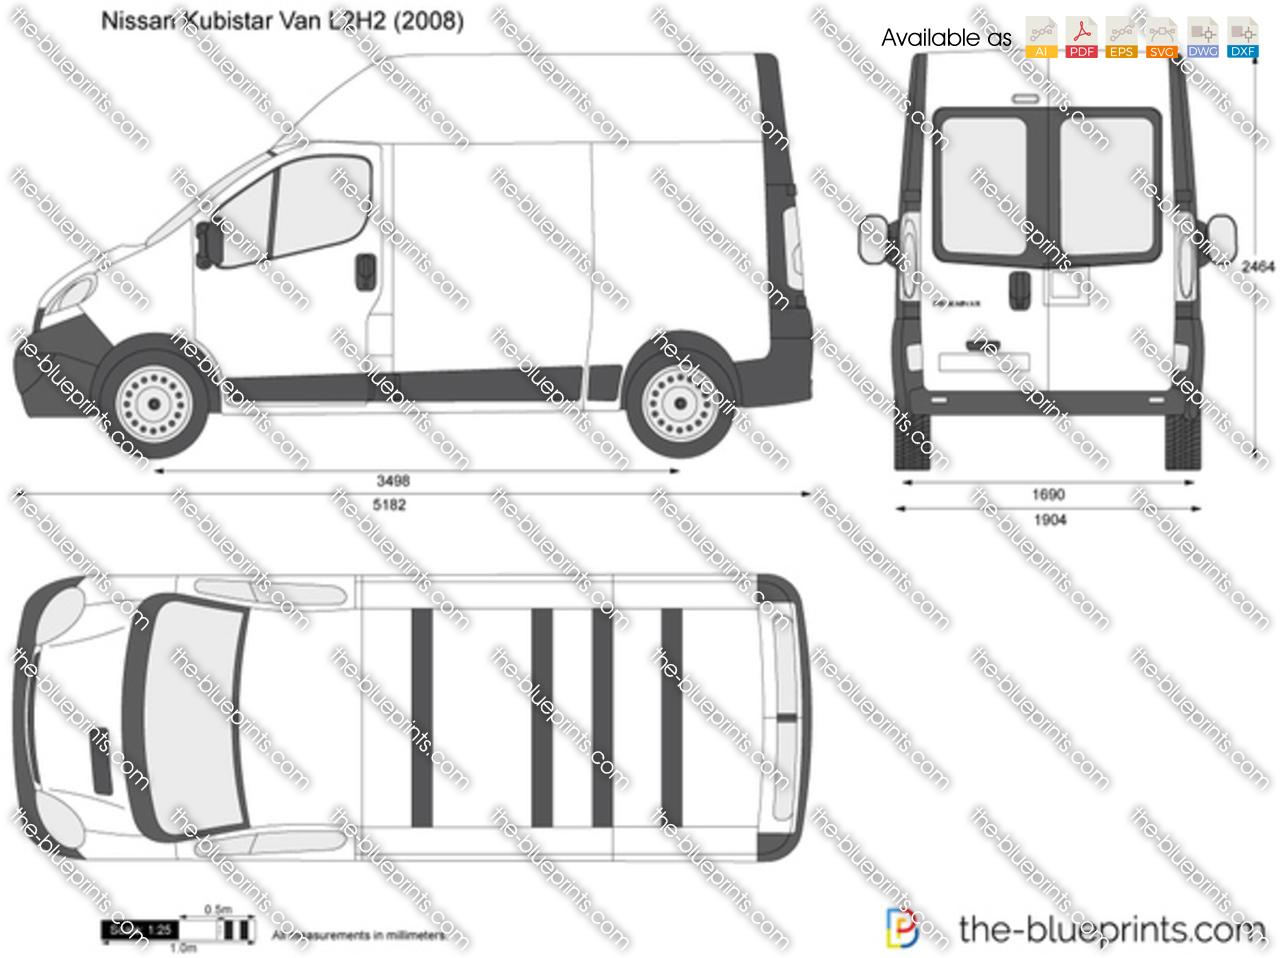 nissan primastar van l2h2 vector drawing. Black Bedroom Furniture Sets. Home Design Ideas